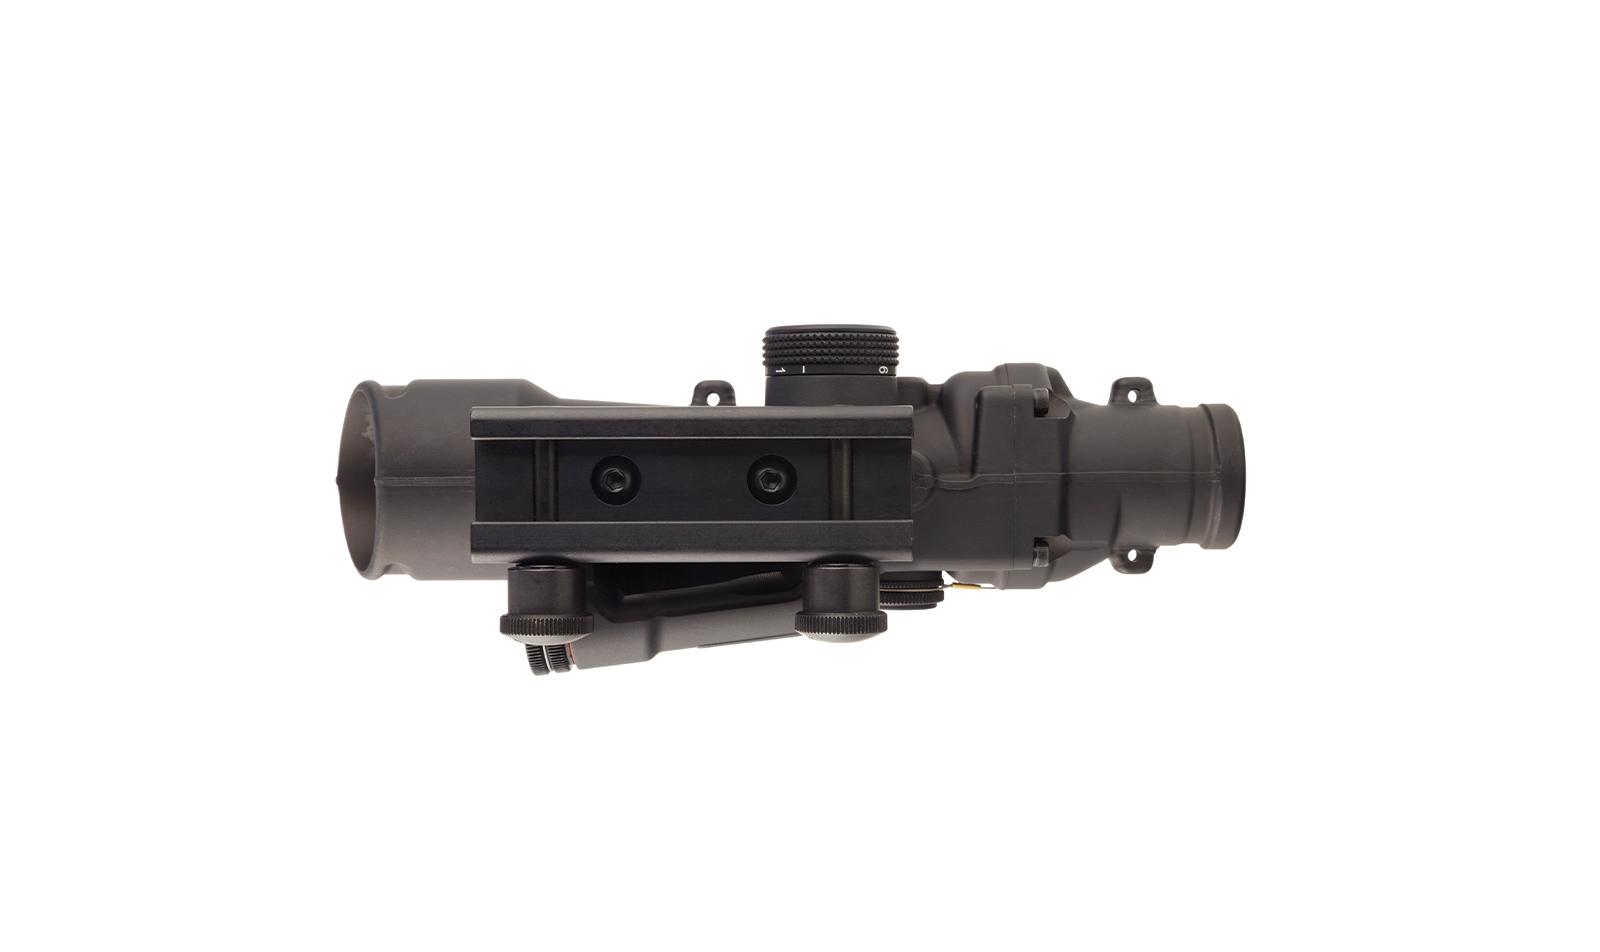 TA110-D-100500 angle 10